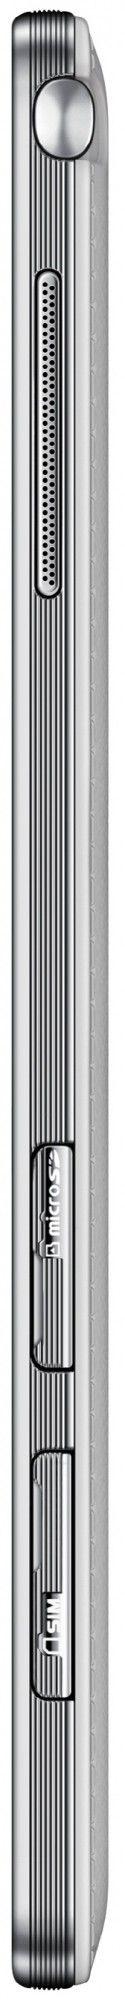 Планшет Samsung Galaxy Note 10.1 2014 Edition (SM-P6000ZWASEK) White - 6